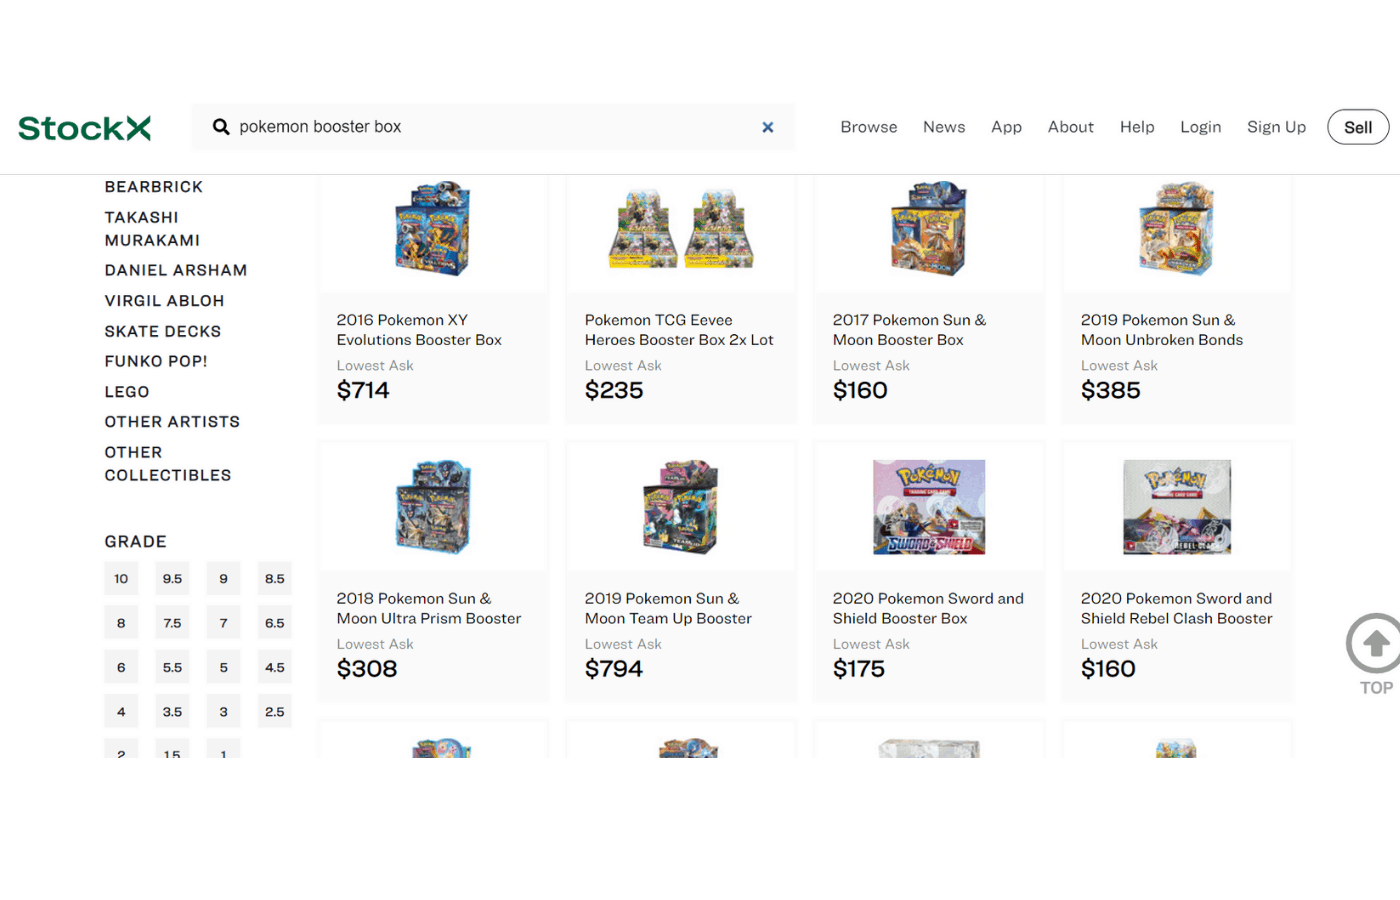 are stockx pokemon cards legit